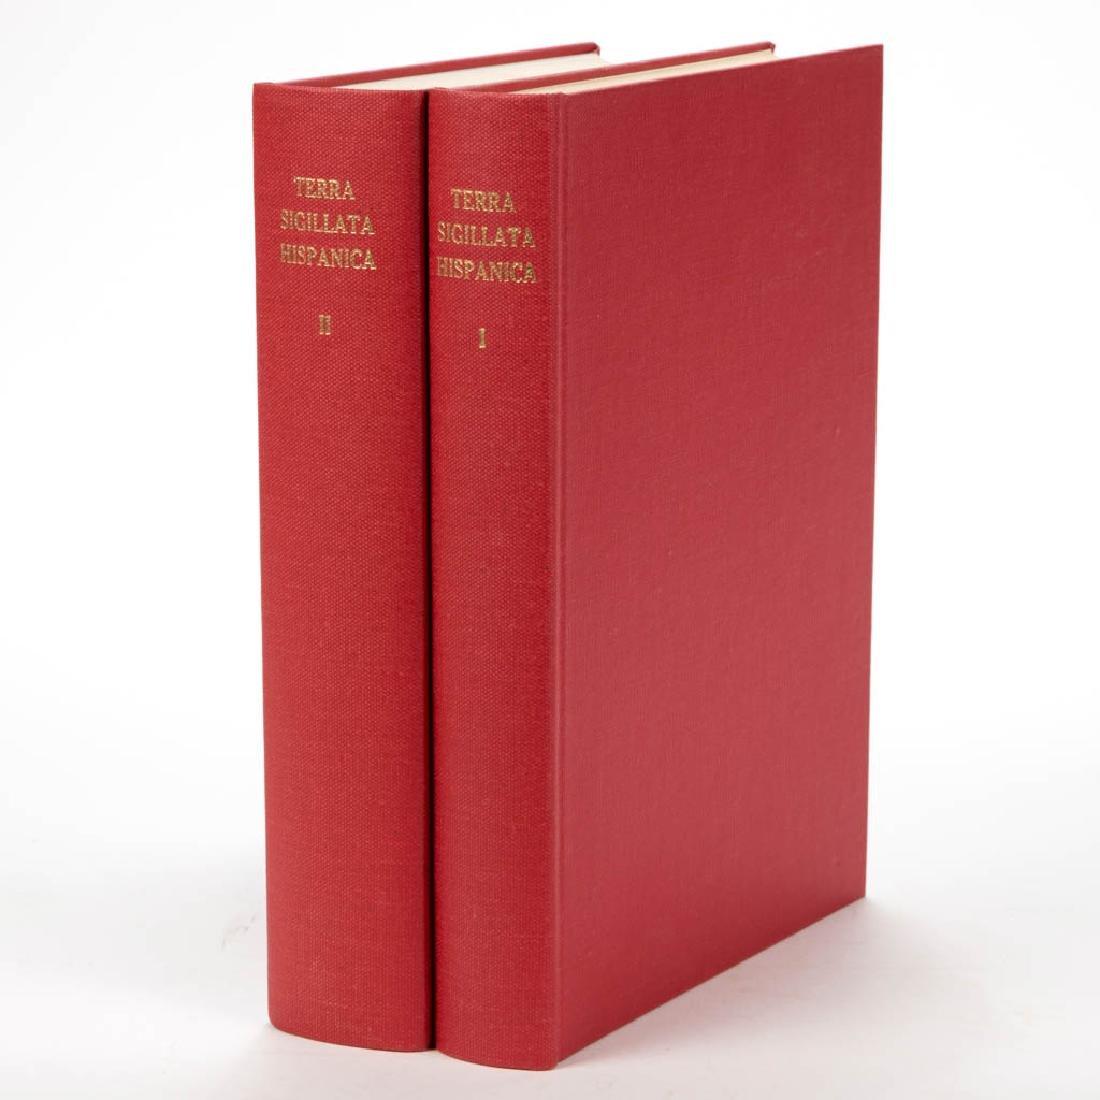 SPANISH TERRA SIGILATTA CERAMIC VOLUMES, LOT OF TWO